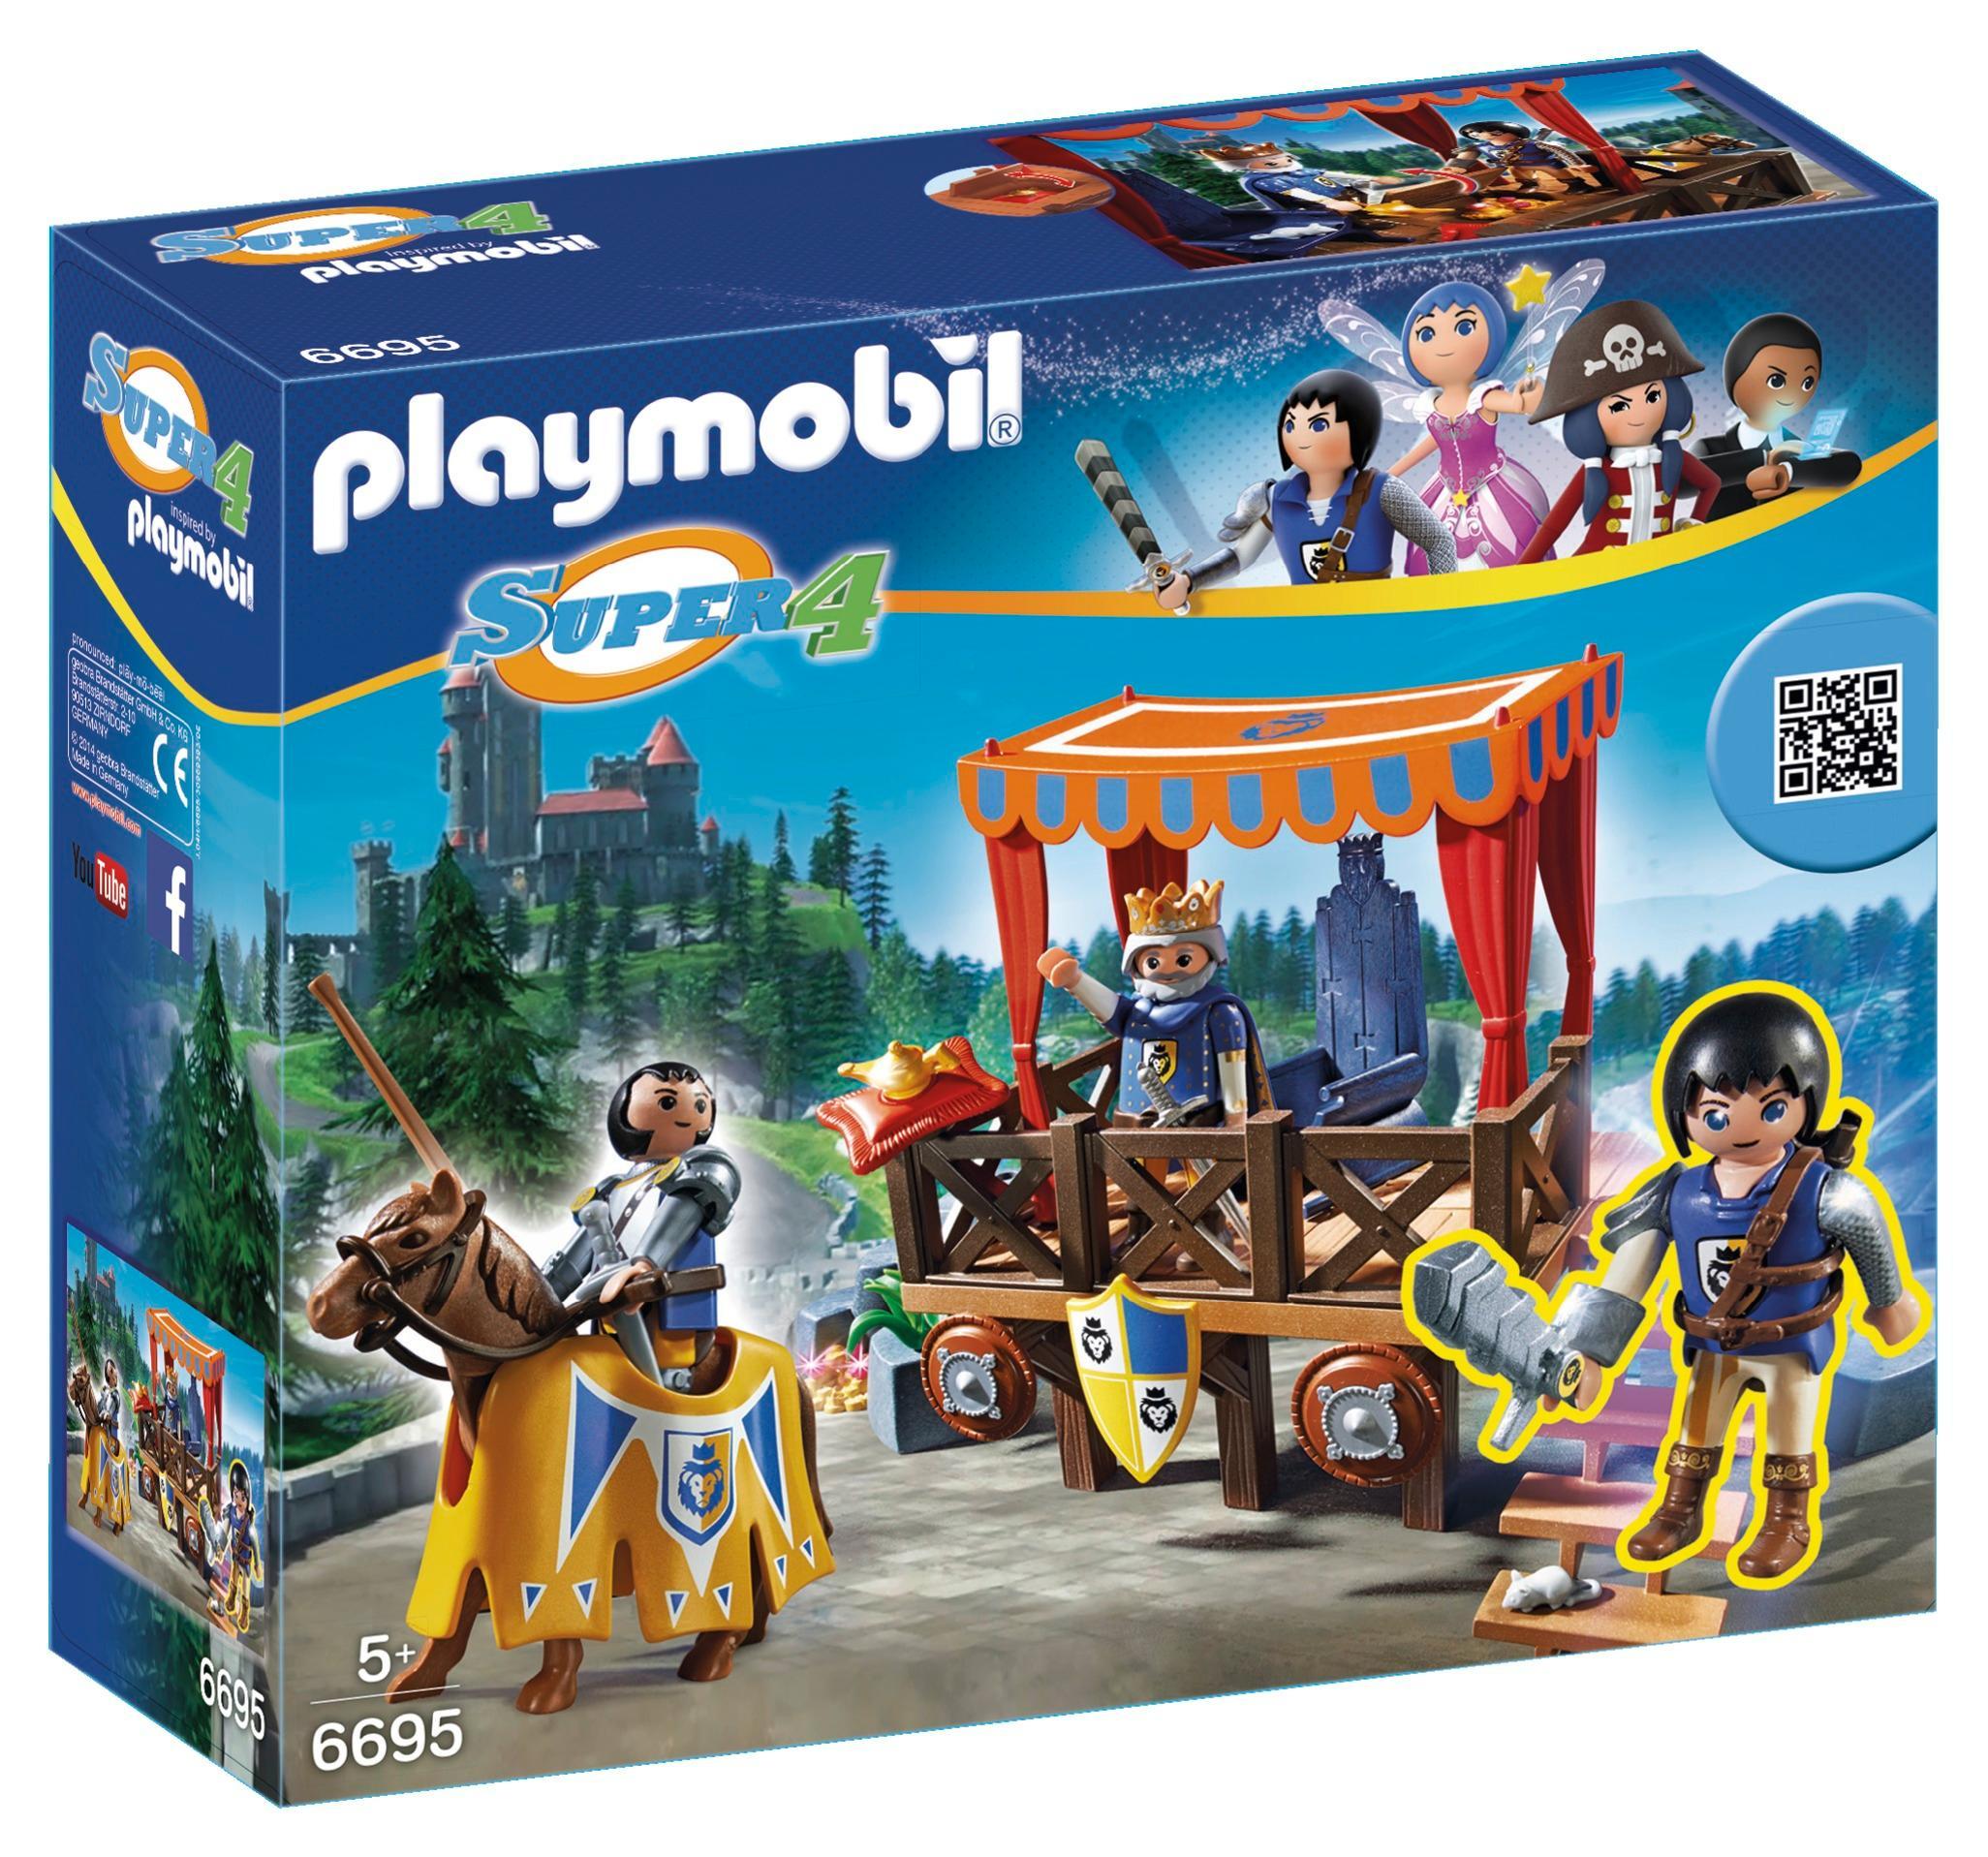 playmobil fairy castle instructions